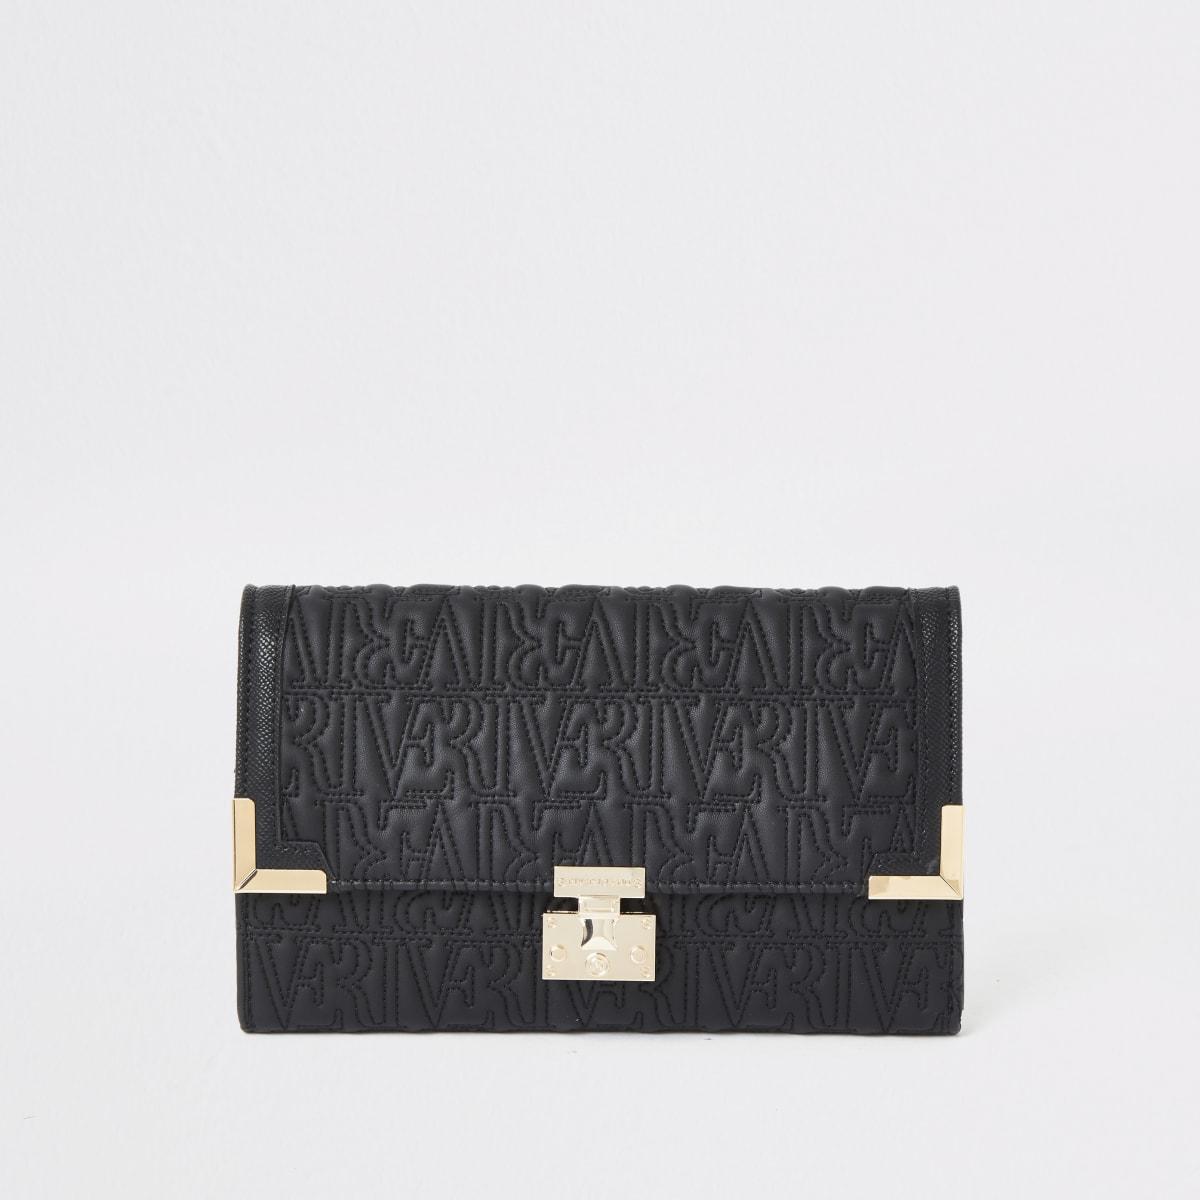 Portefeuille de voyage noir avec logo RI en relief